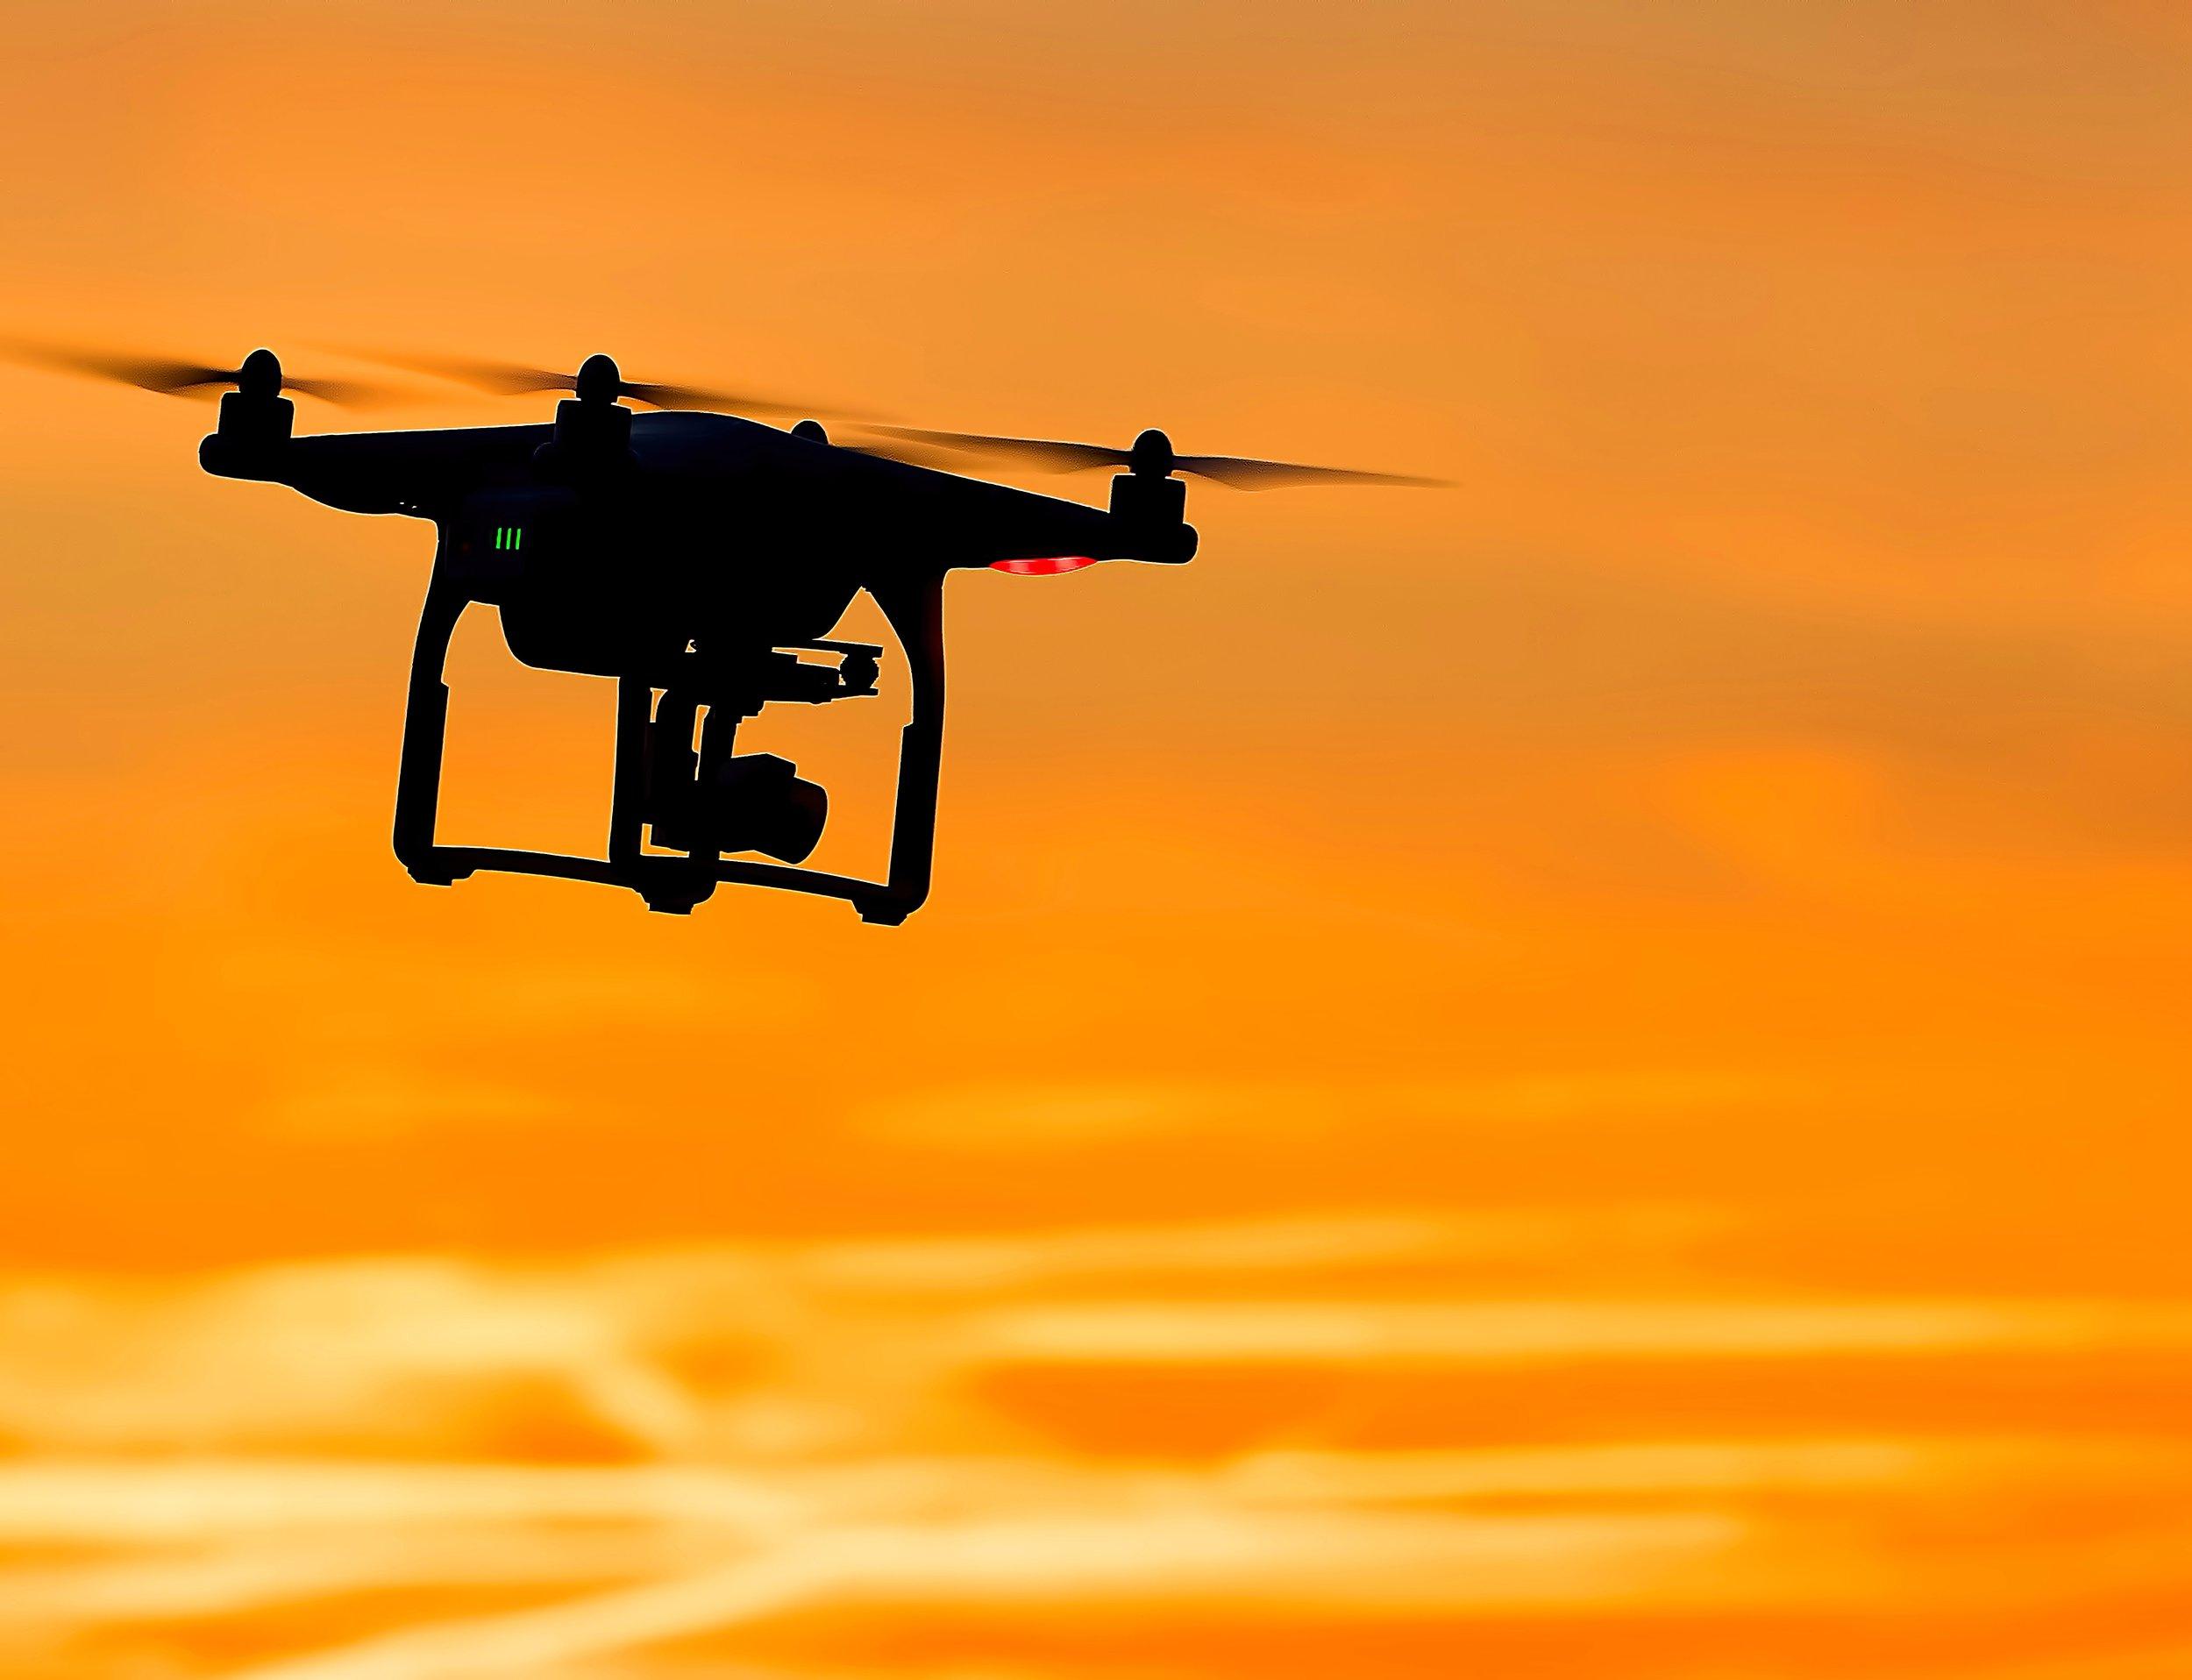 ricardo-gomez-angel-268594-drone.jpg